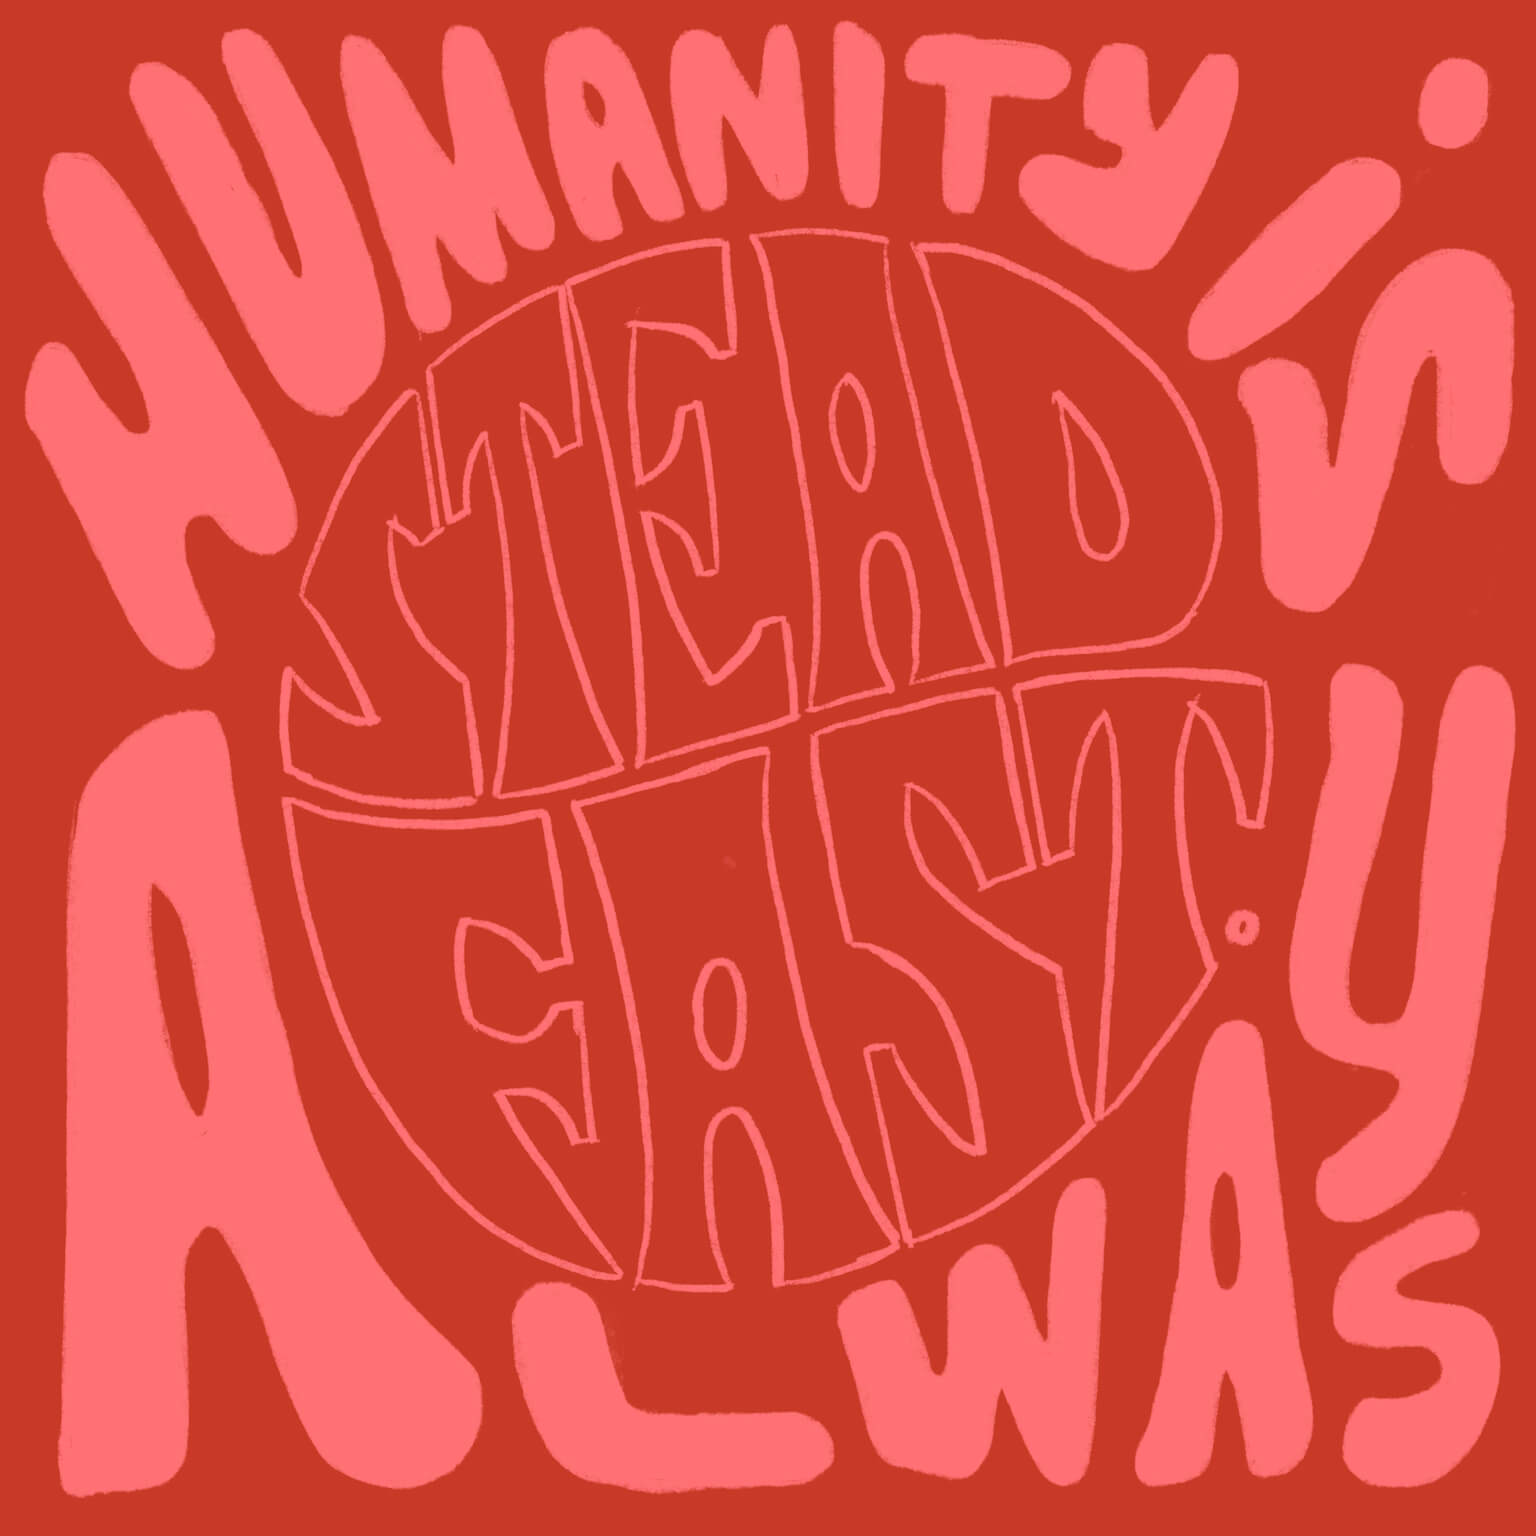 Humanity Is Always Steadfast main image